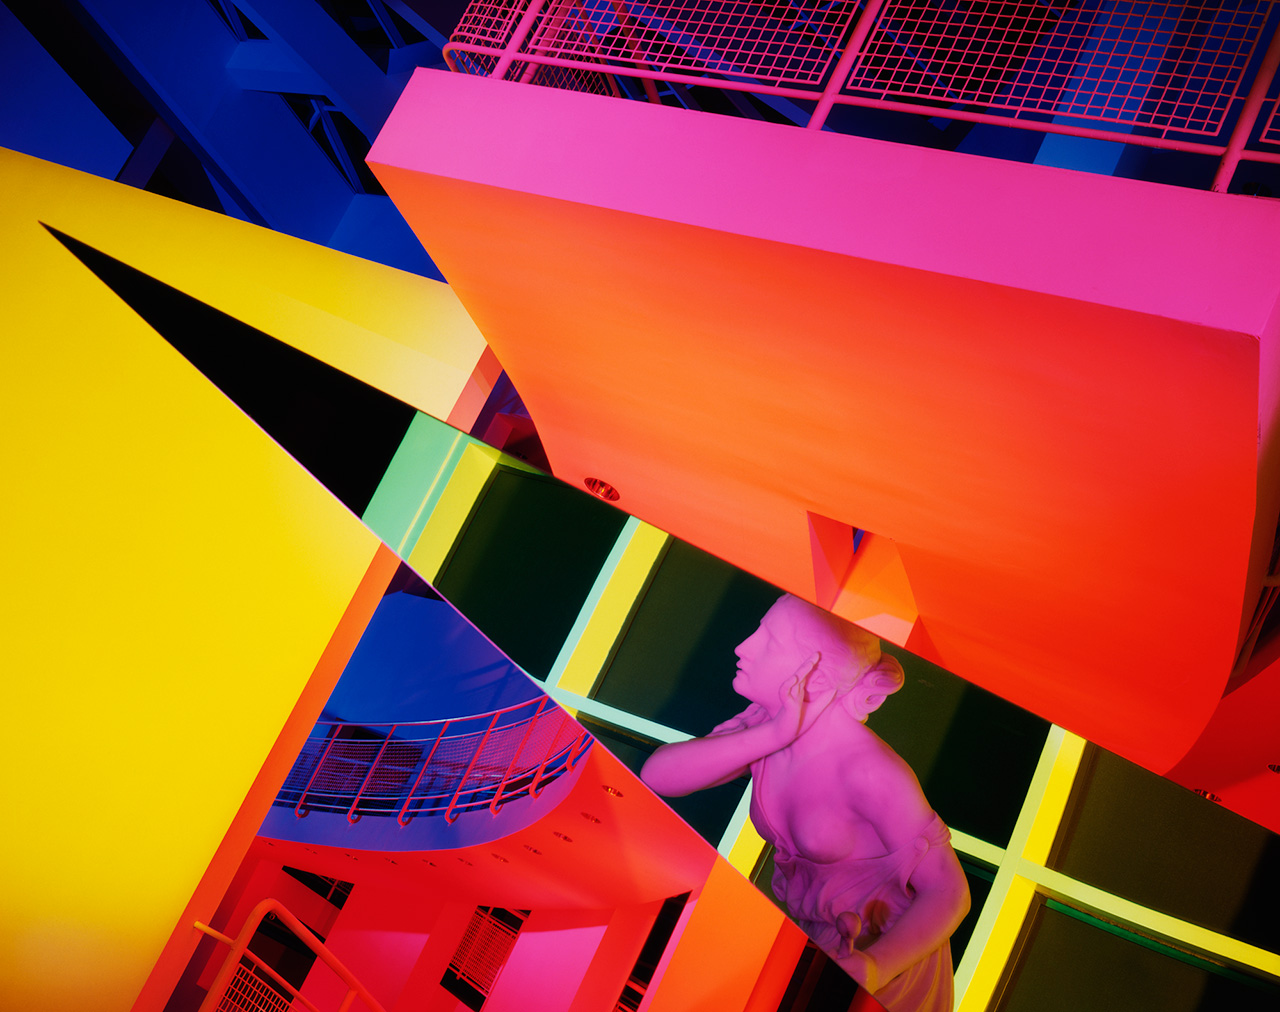 "Barbara Kasten, ""Architectural Site 17, August 29, 1988"" (1988), cibachrome, 60 x 50 in. (location: High Museum of Art, Atlanta, Georgia; architect: Richard Meier) (courtesy of the artist)"